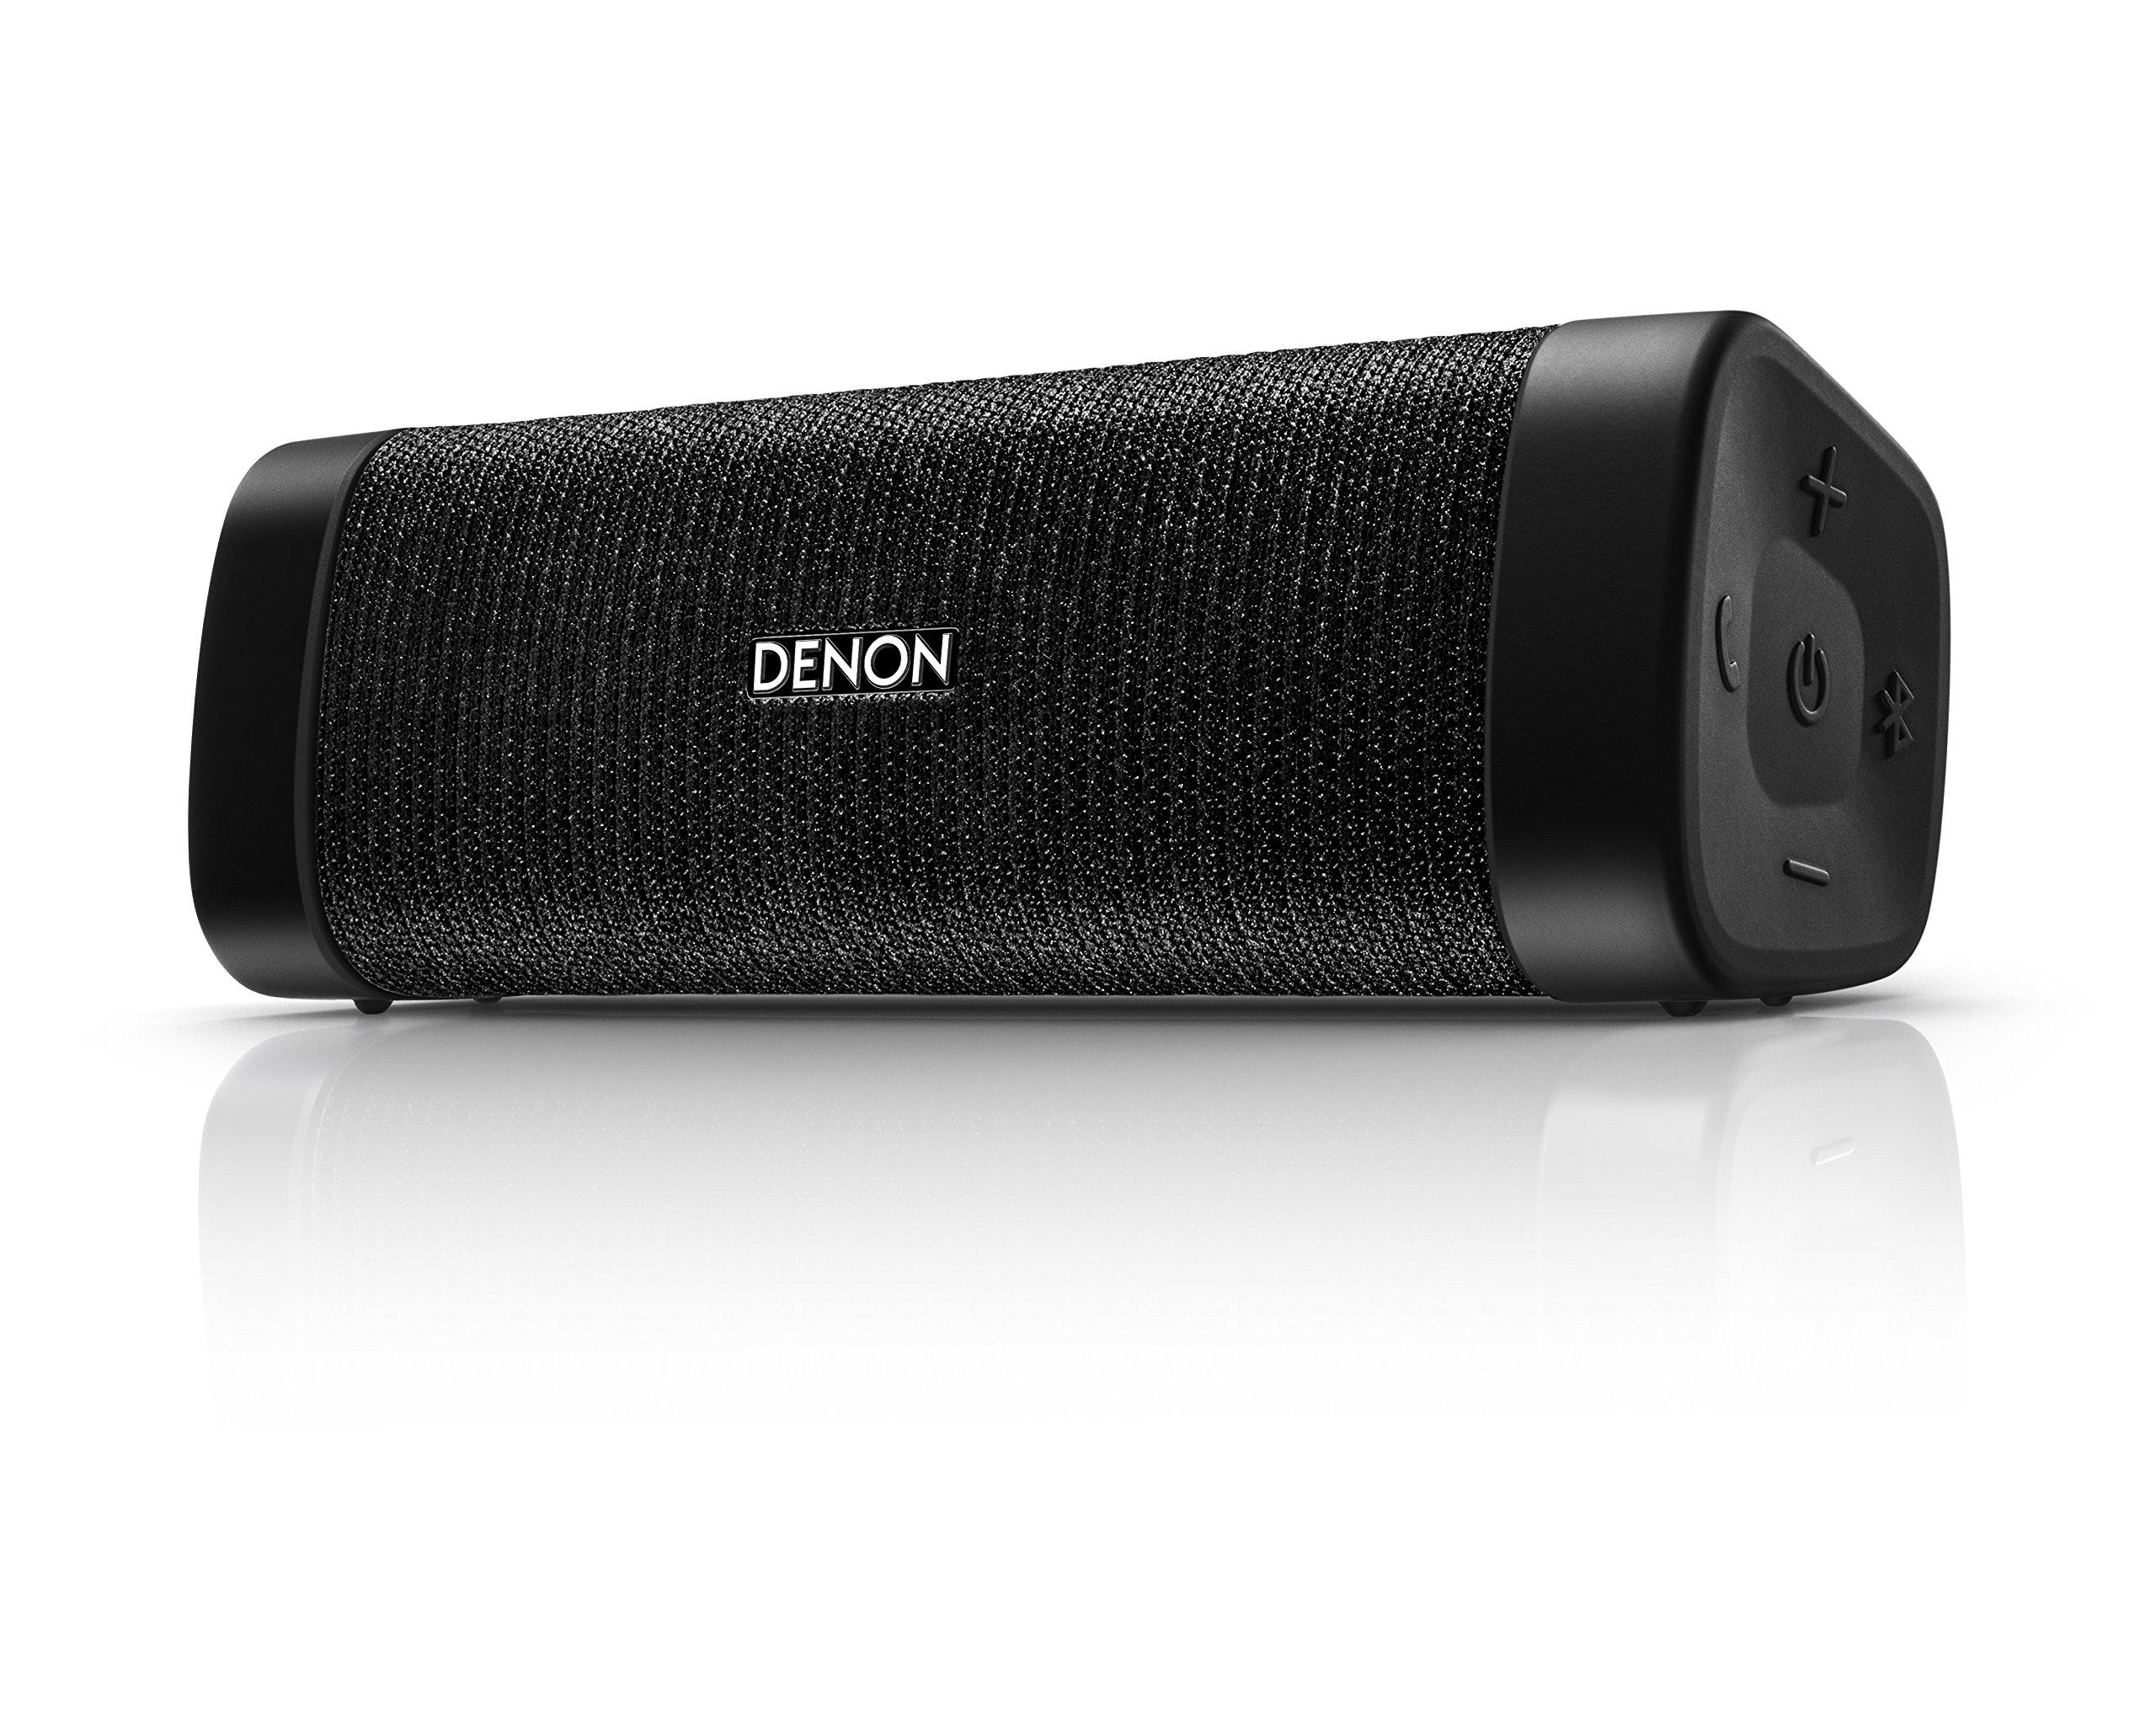 Denon DSB-50BT Envaya Pocket Portable Premium Bluetooth Speaker - Black